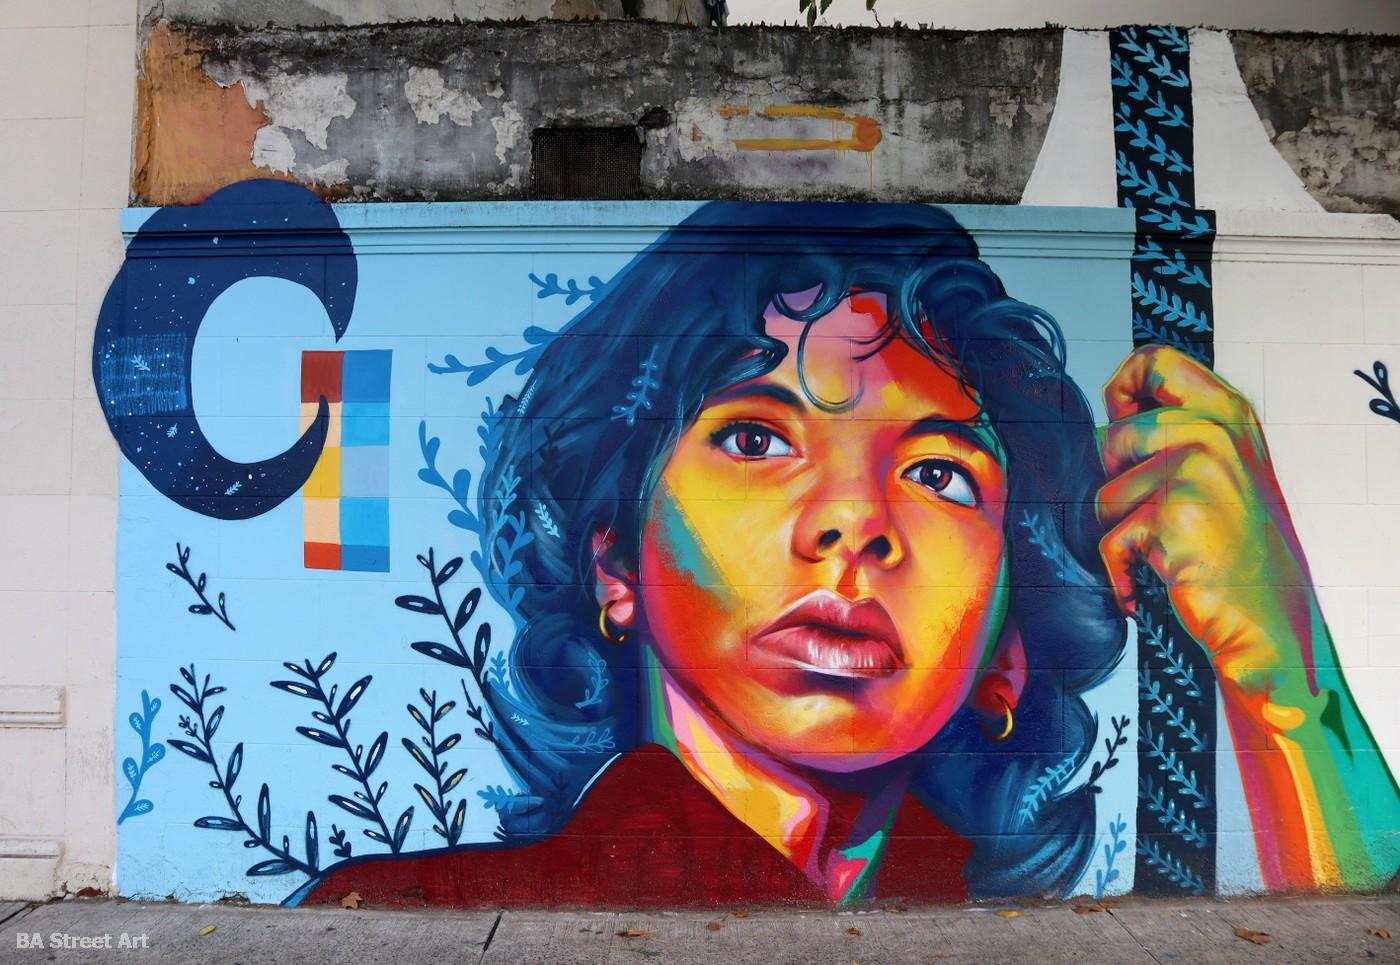 thomas evans detour artist detroit mural in buenos aires argentina arte urbano street art graffiti buenosairesstreetart.com